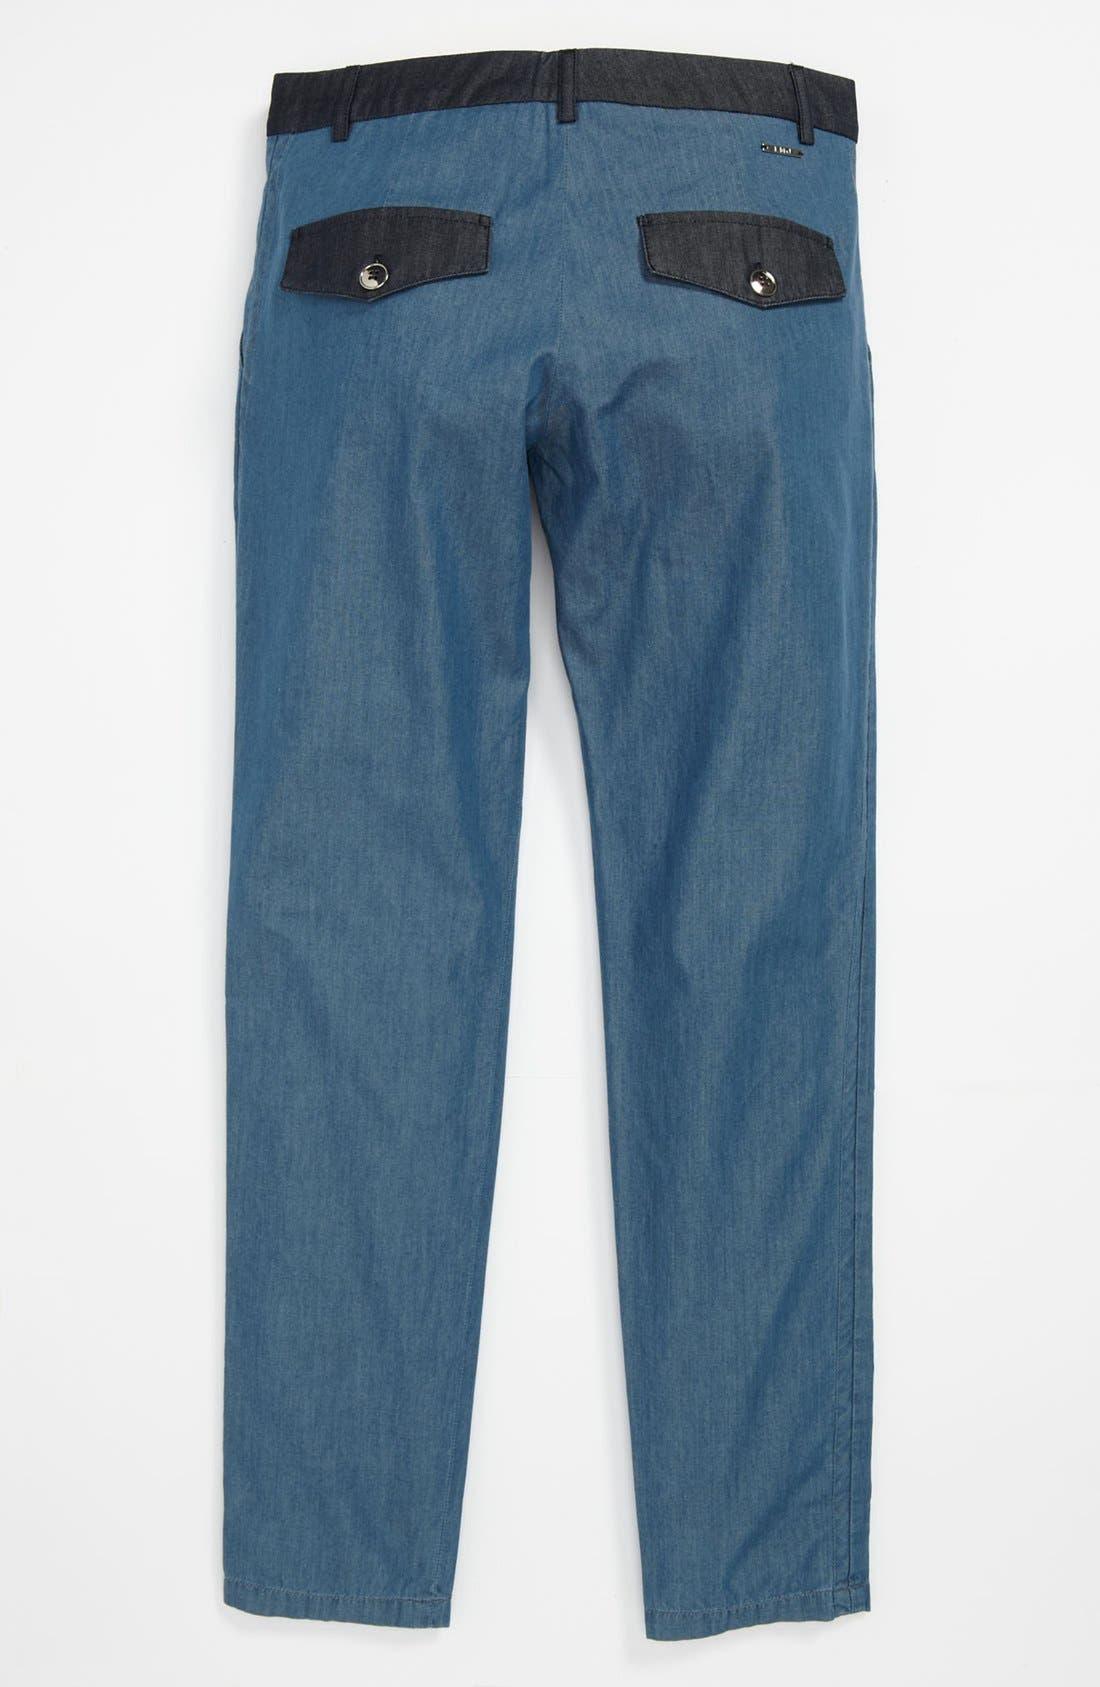 Main Image - LITTLE MARC JACOBS Chambray Pants (Big Girls)